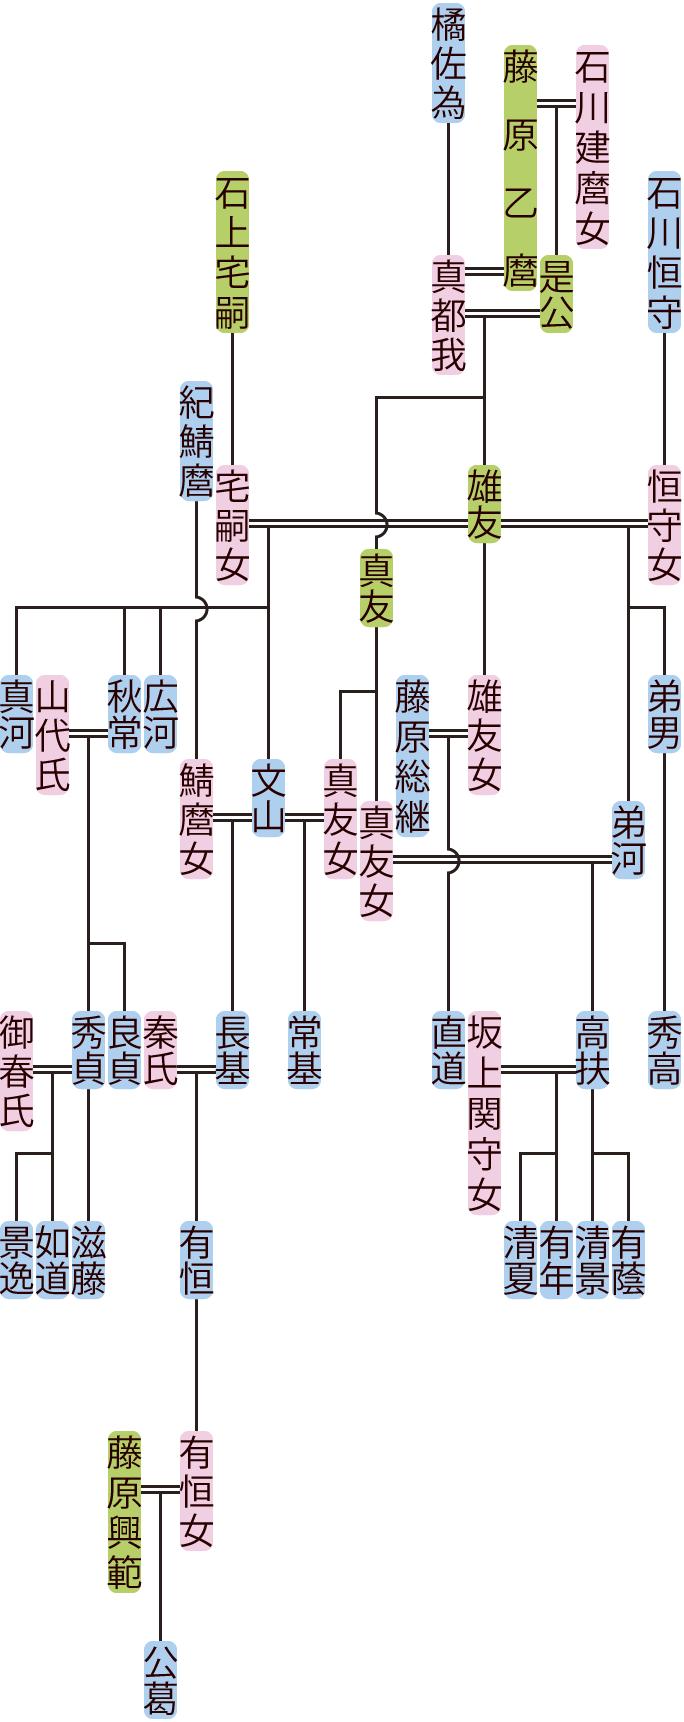 藤原雄友・弟河の系図